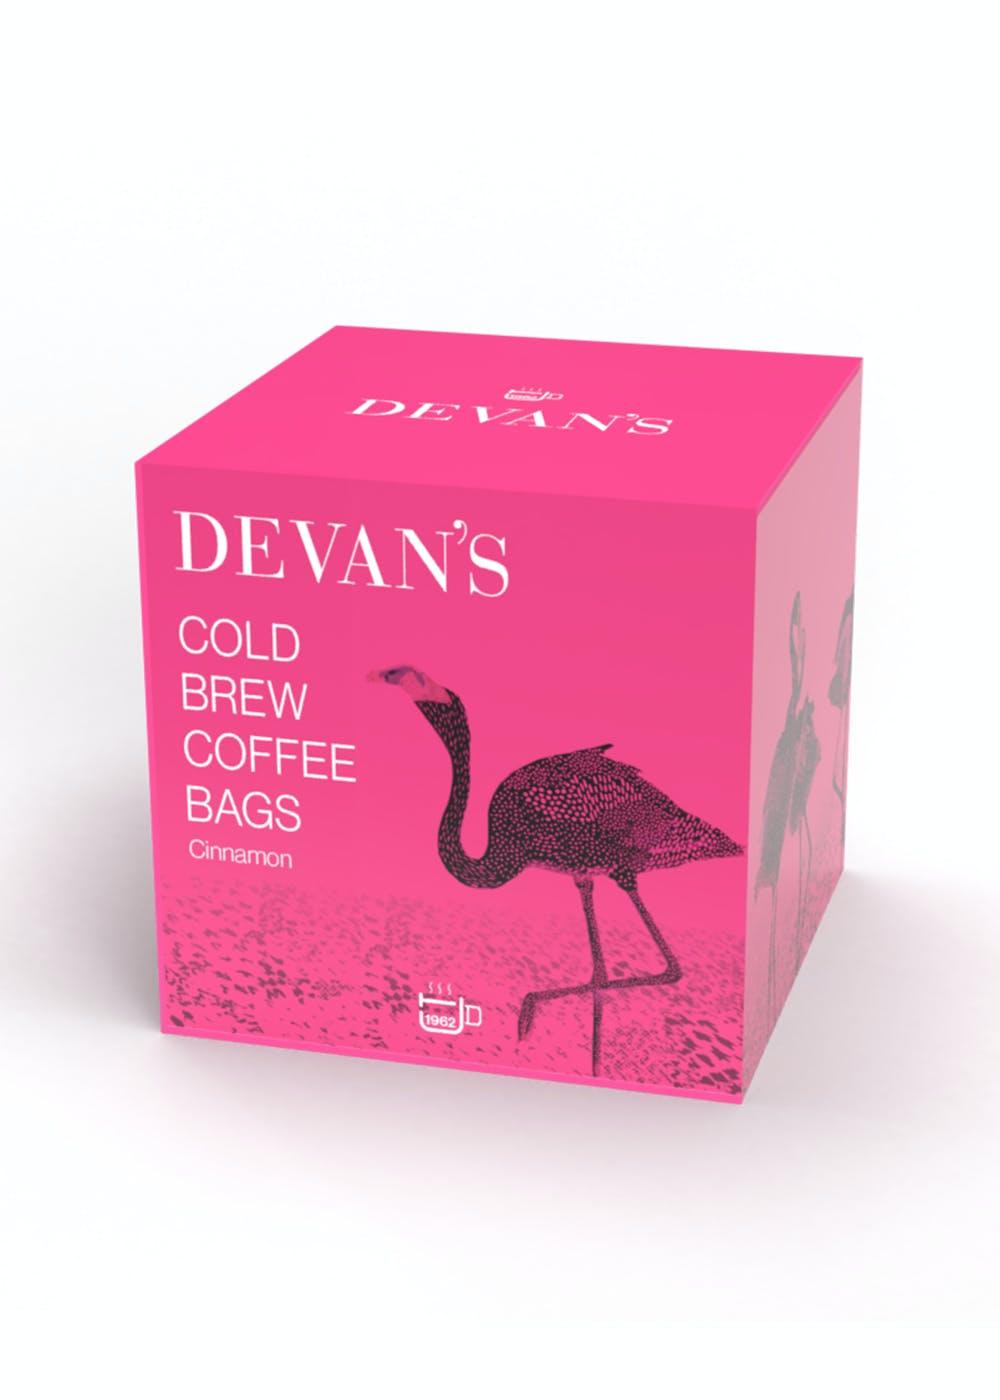 Cold Brew Coffee Bag  with Cinnamon - 5 Coffee Bags